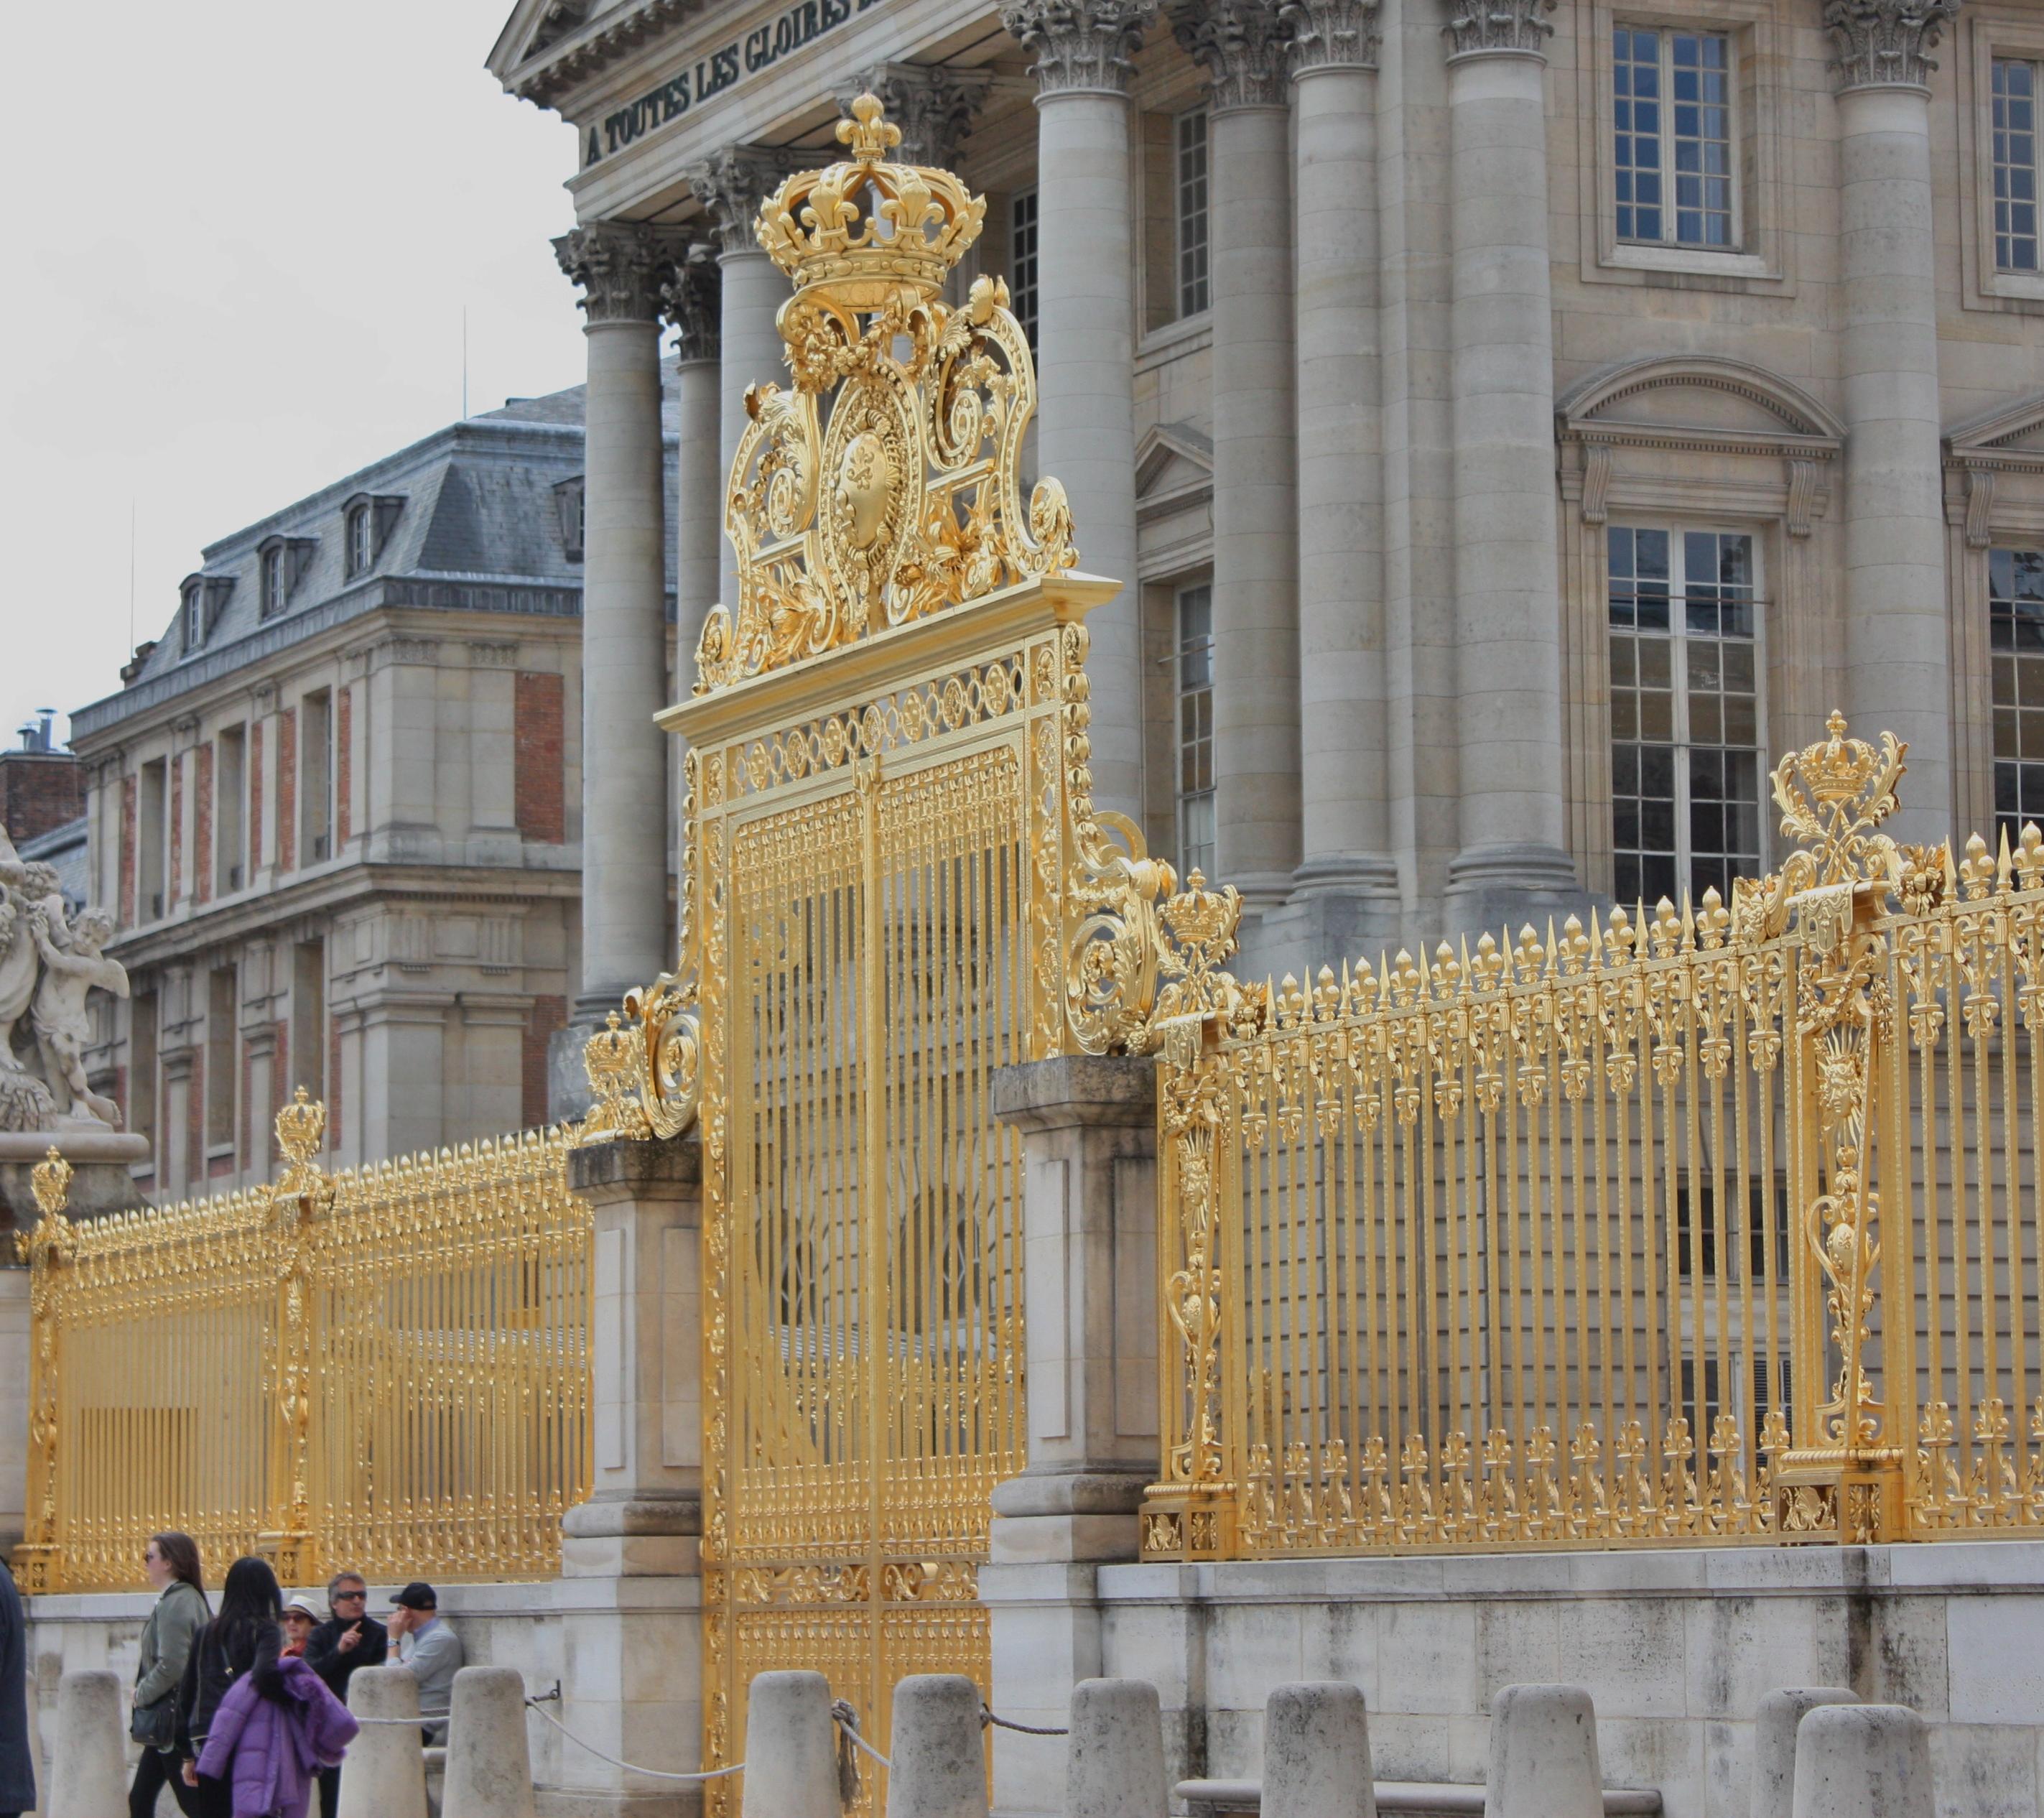 Palace of versailles displaced beachbums for Versailles paris